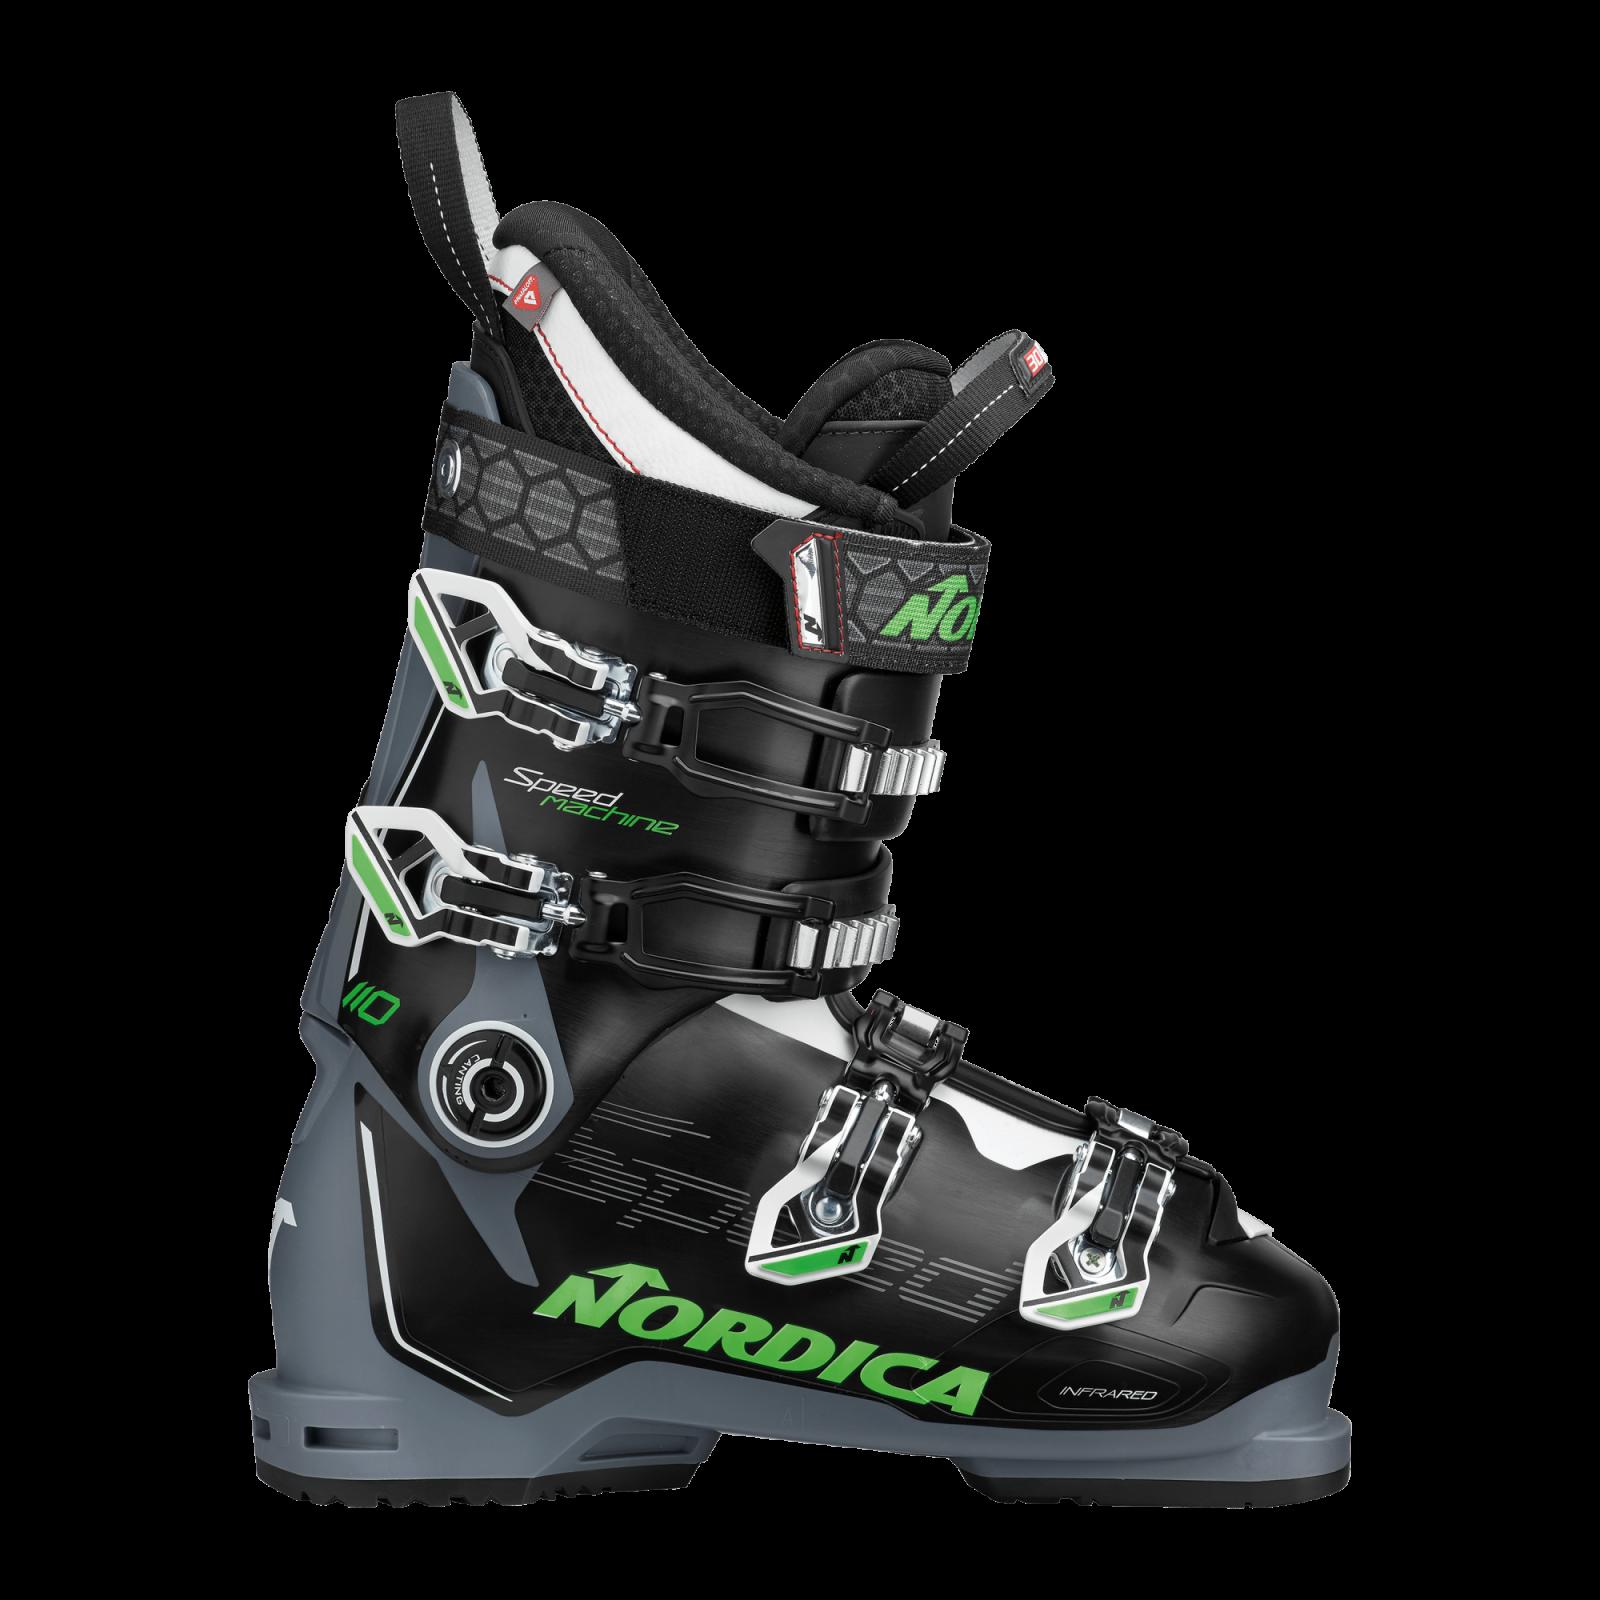 2020 Nordica Speedmachine 110 Men's Ski Boots